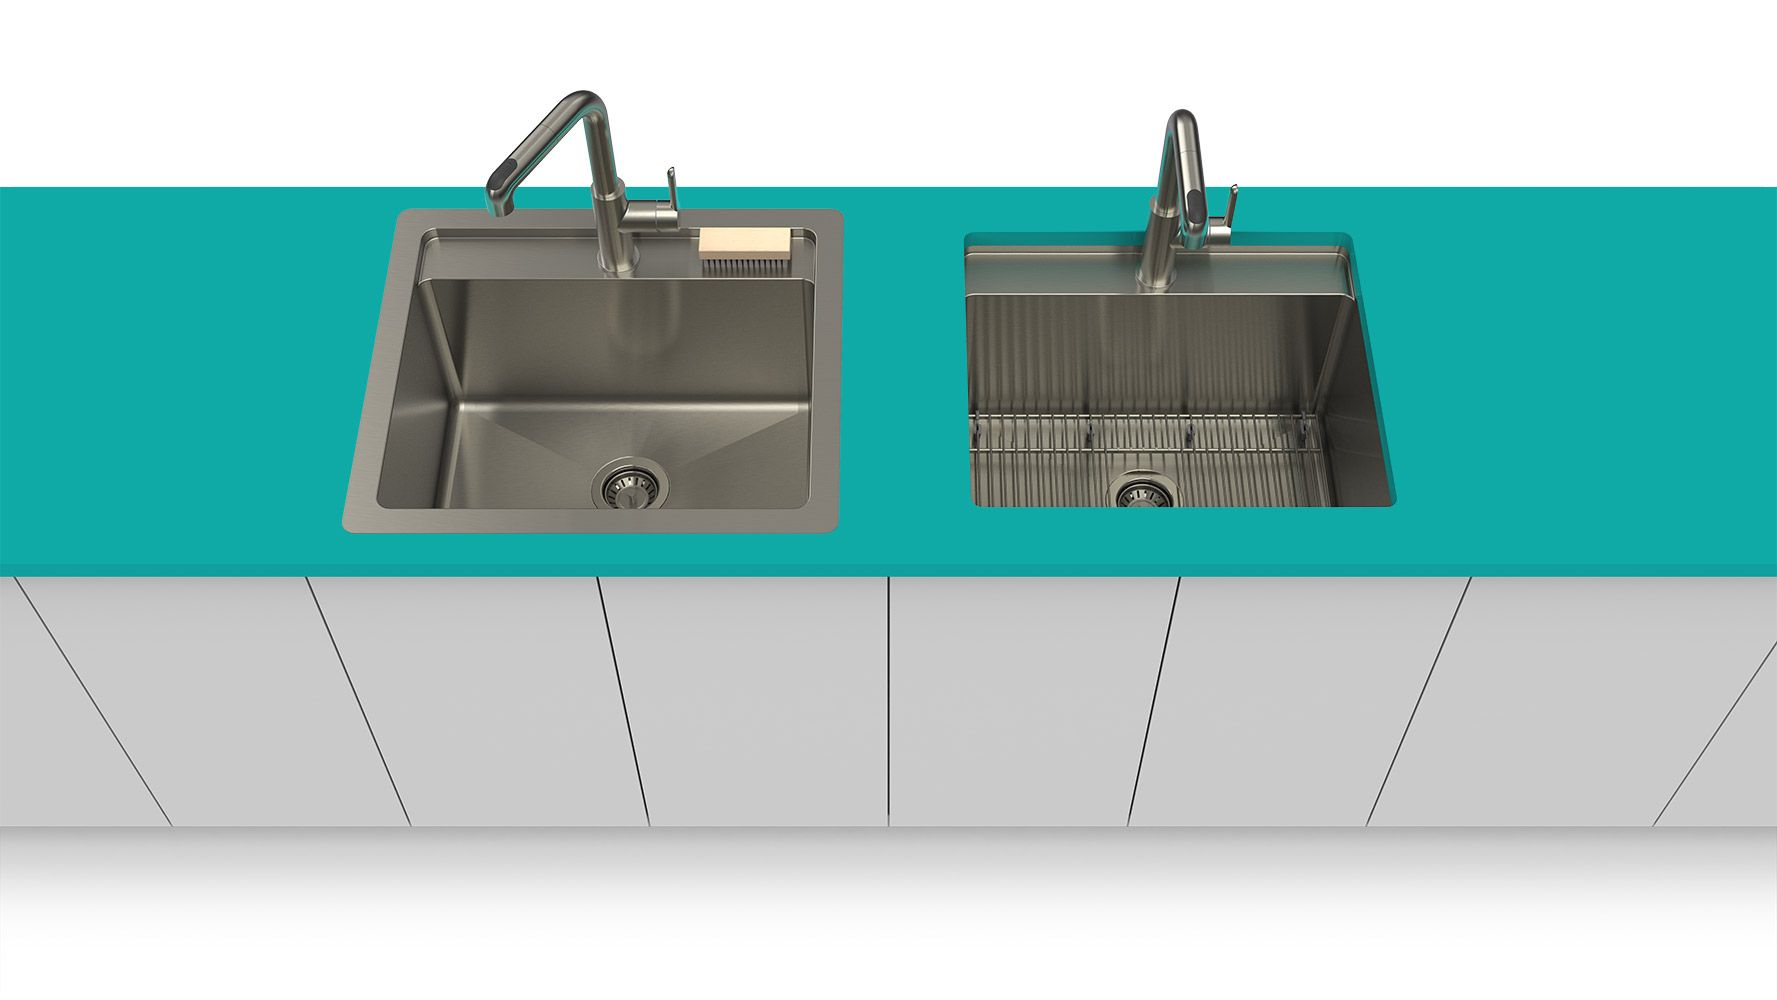 Stainless steel kitchen sinks and fireclay sinks - Prochef | Kitchen ...